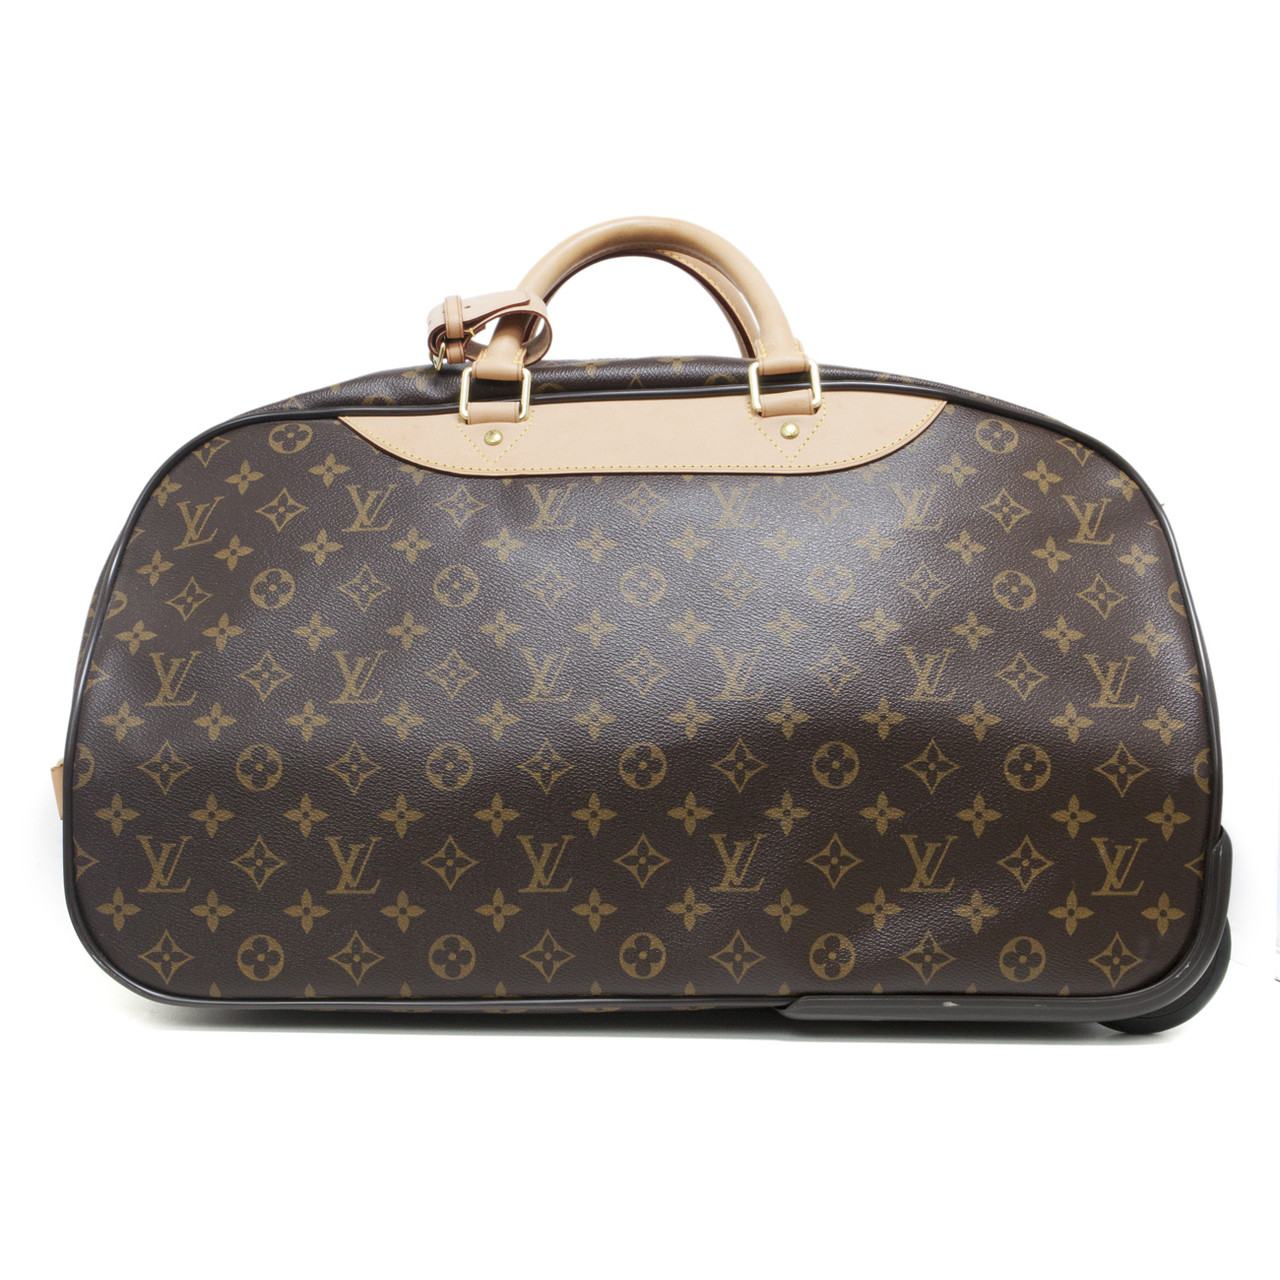 ade53f207c7b Louis Vuitton Monogram Eole 50 Rolling Luggage - modaselle